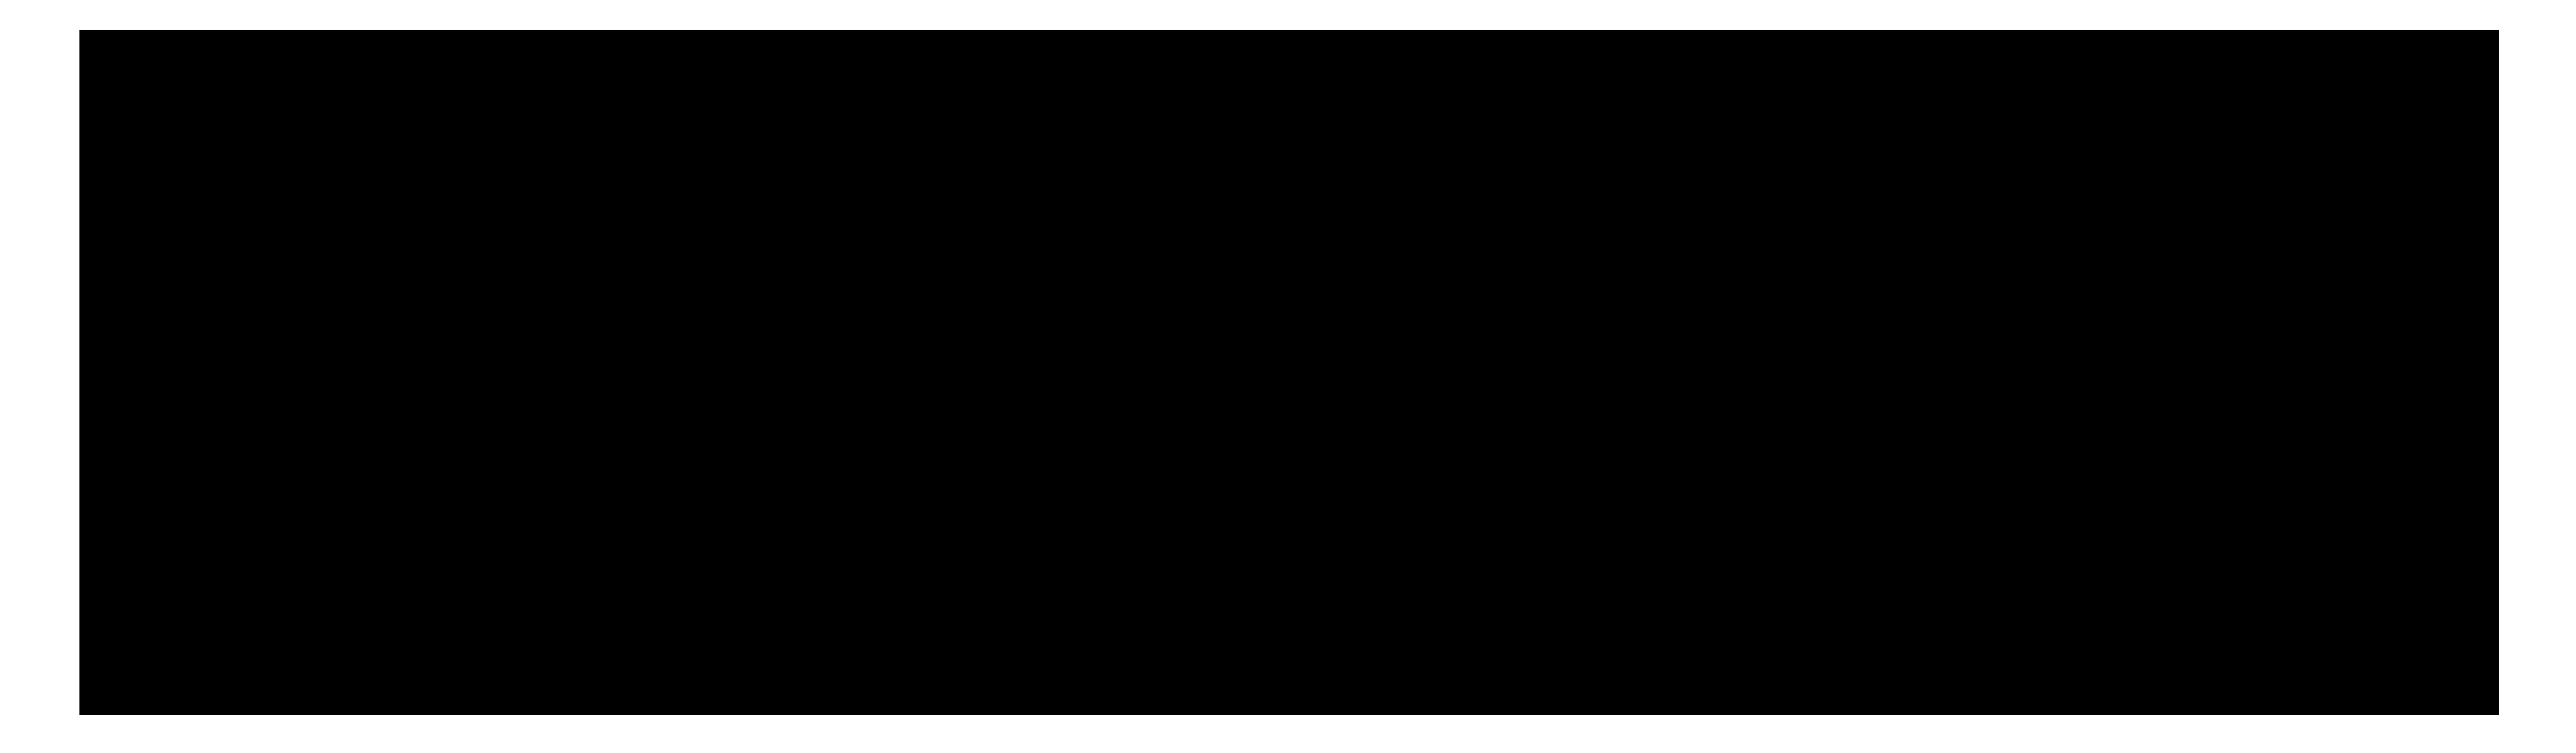 Zazzle Ndash Logos Download